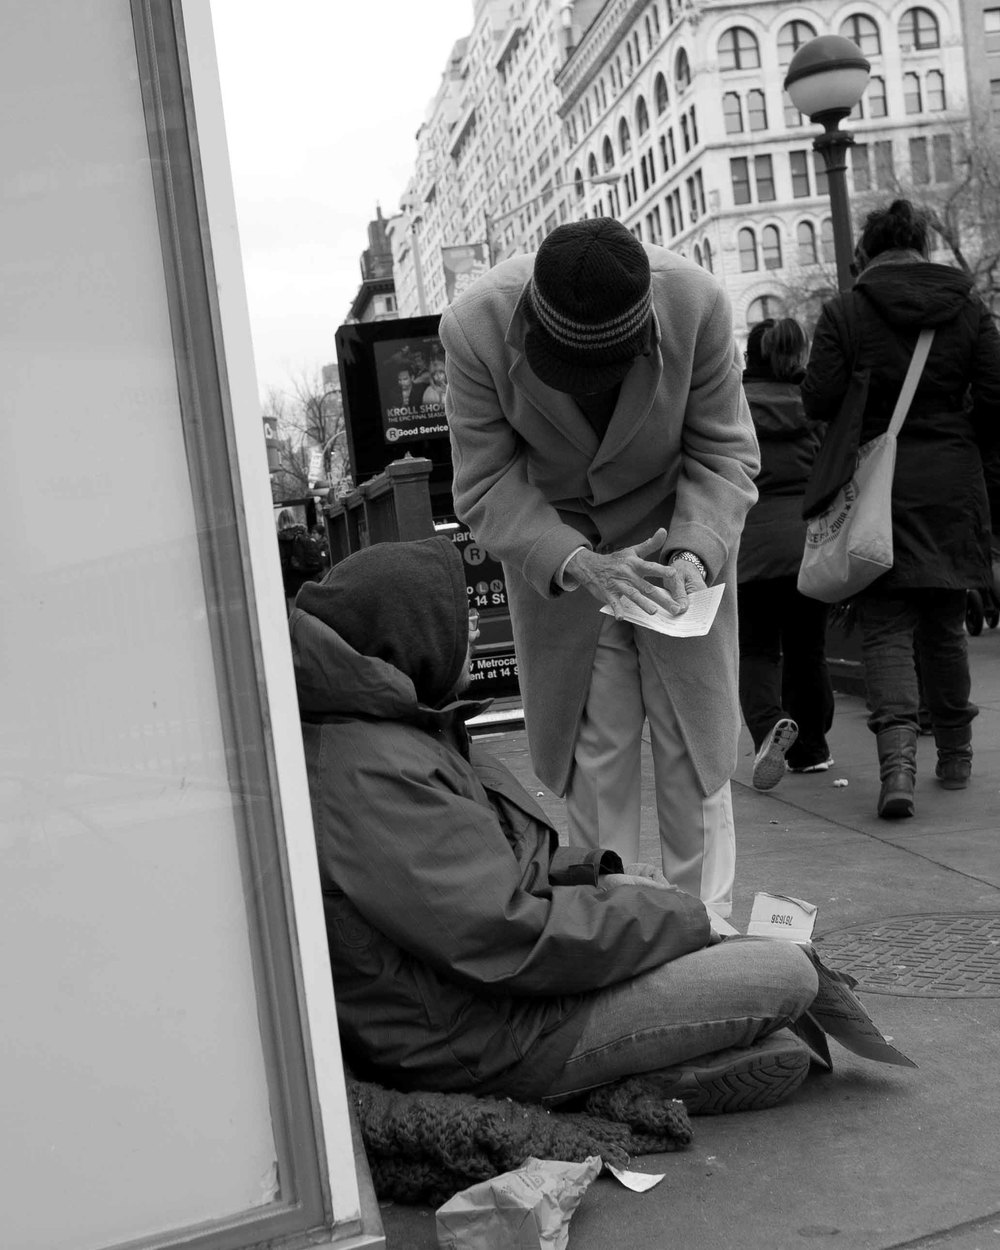 Streetphotography 3.0-94.jpg